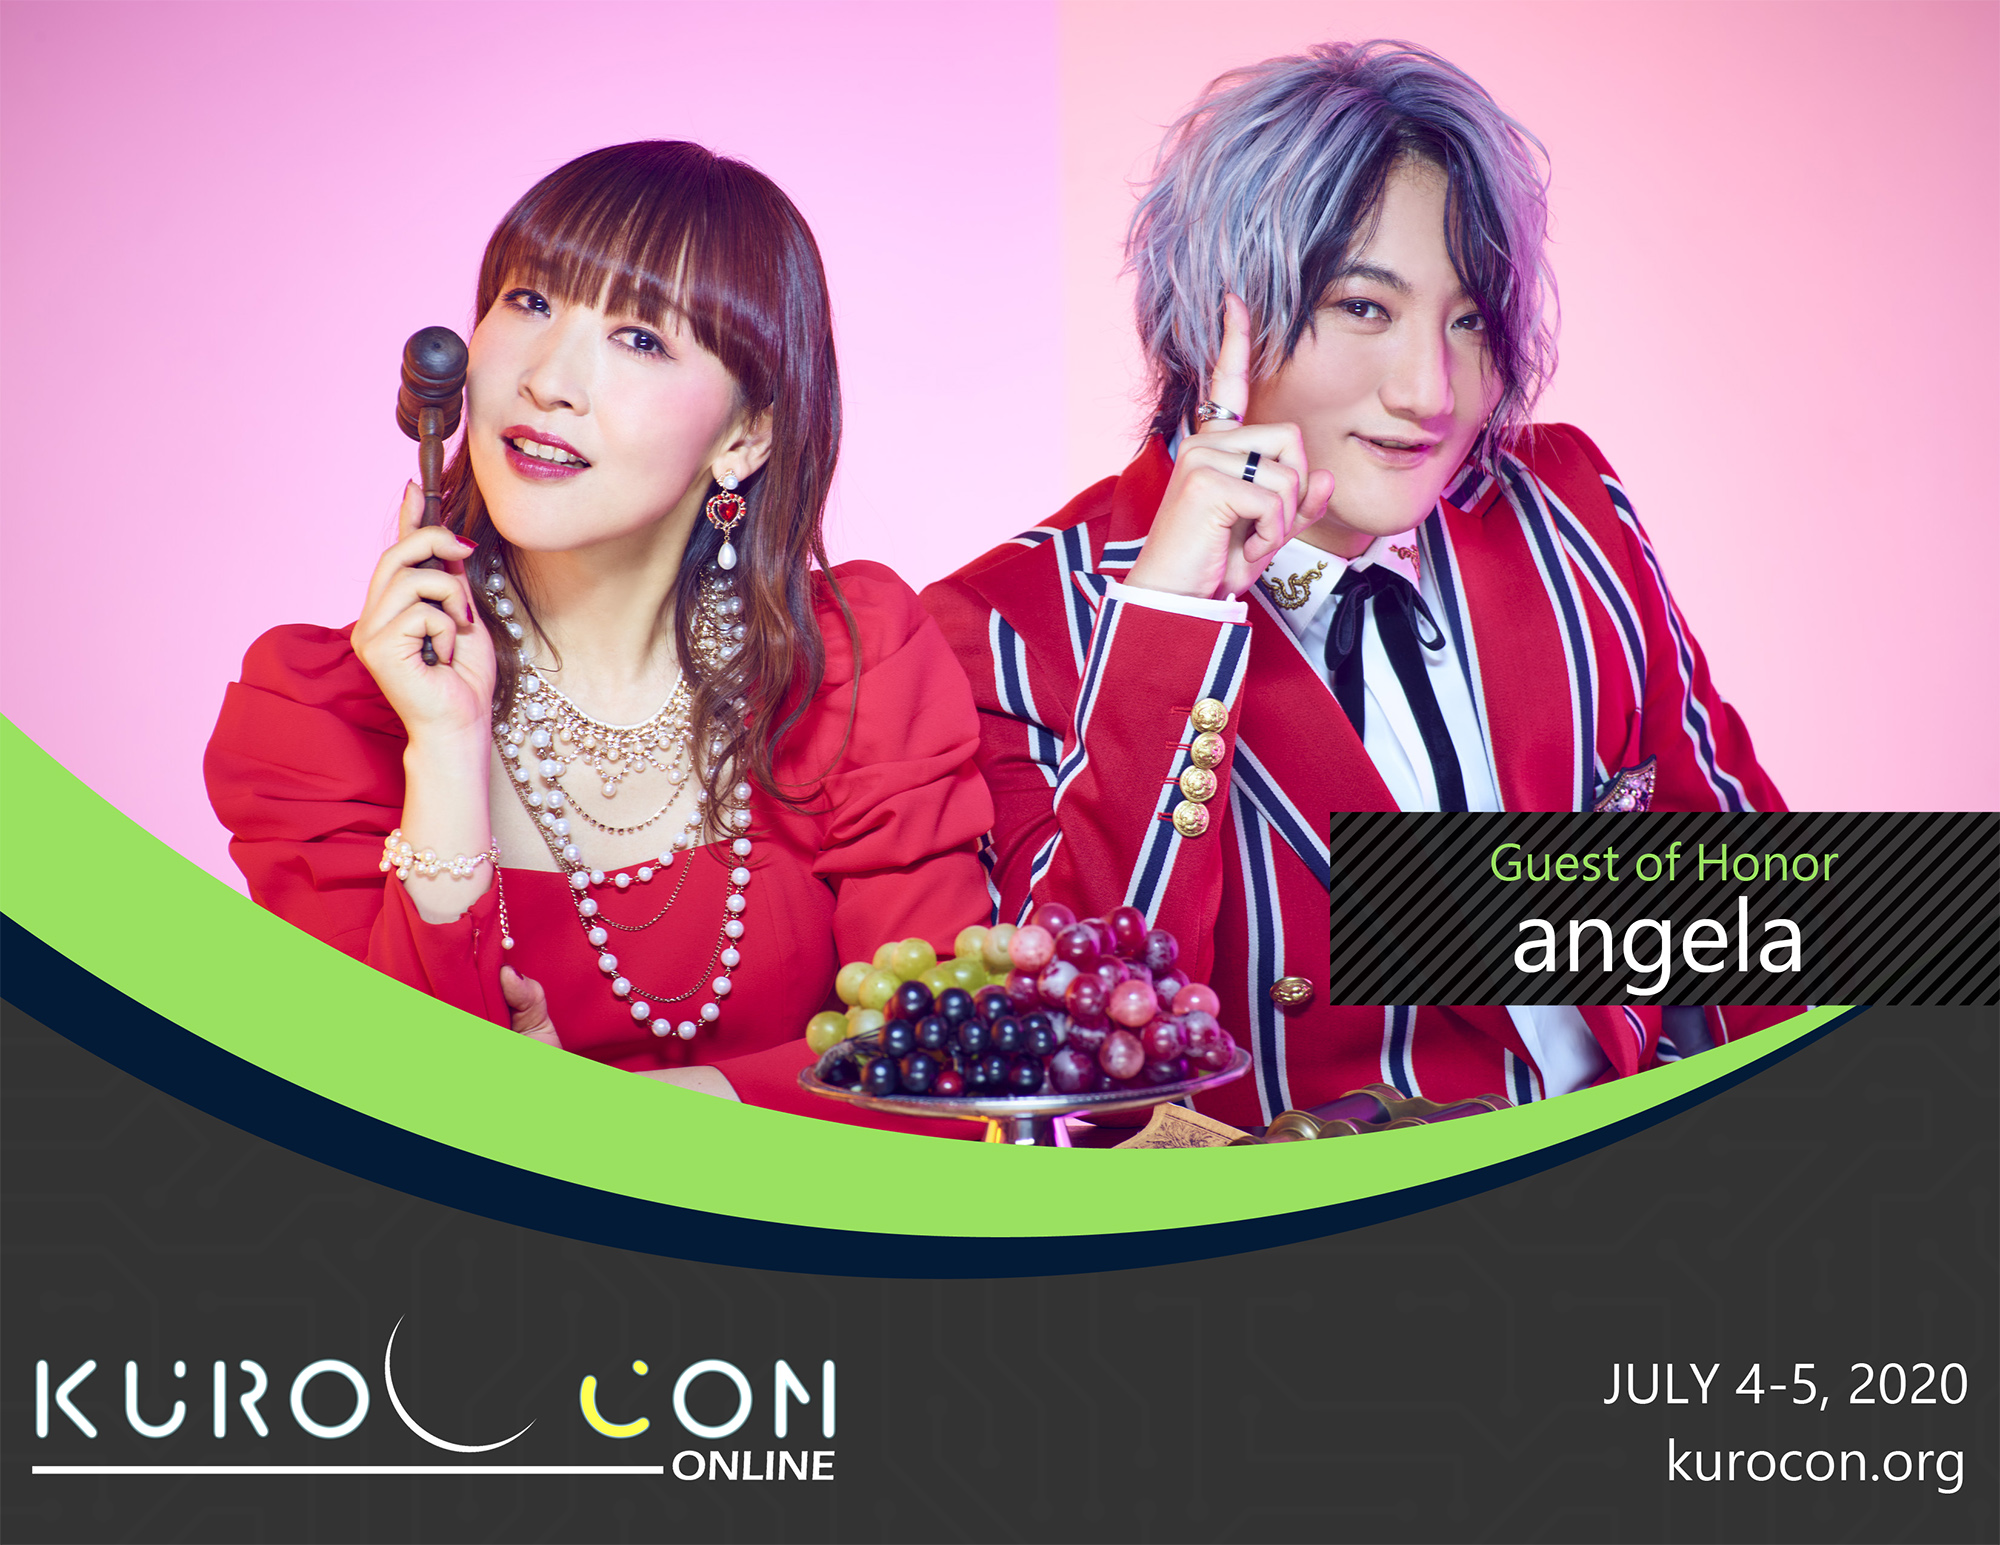 KuroCon Onlineの配信スケジュール発表&angelaさんの出演が発表